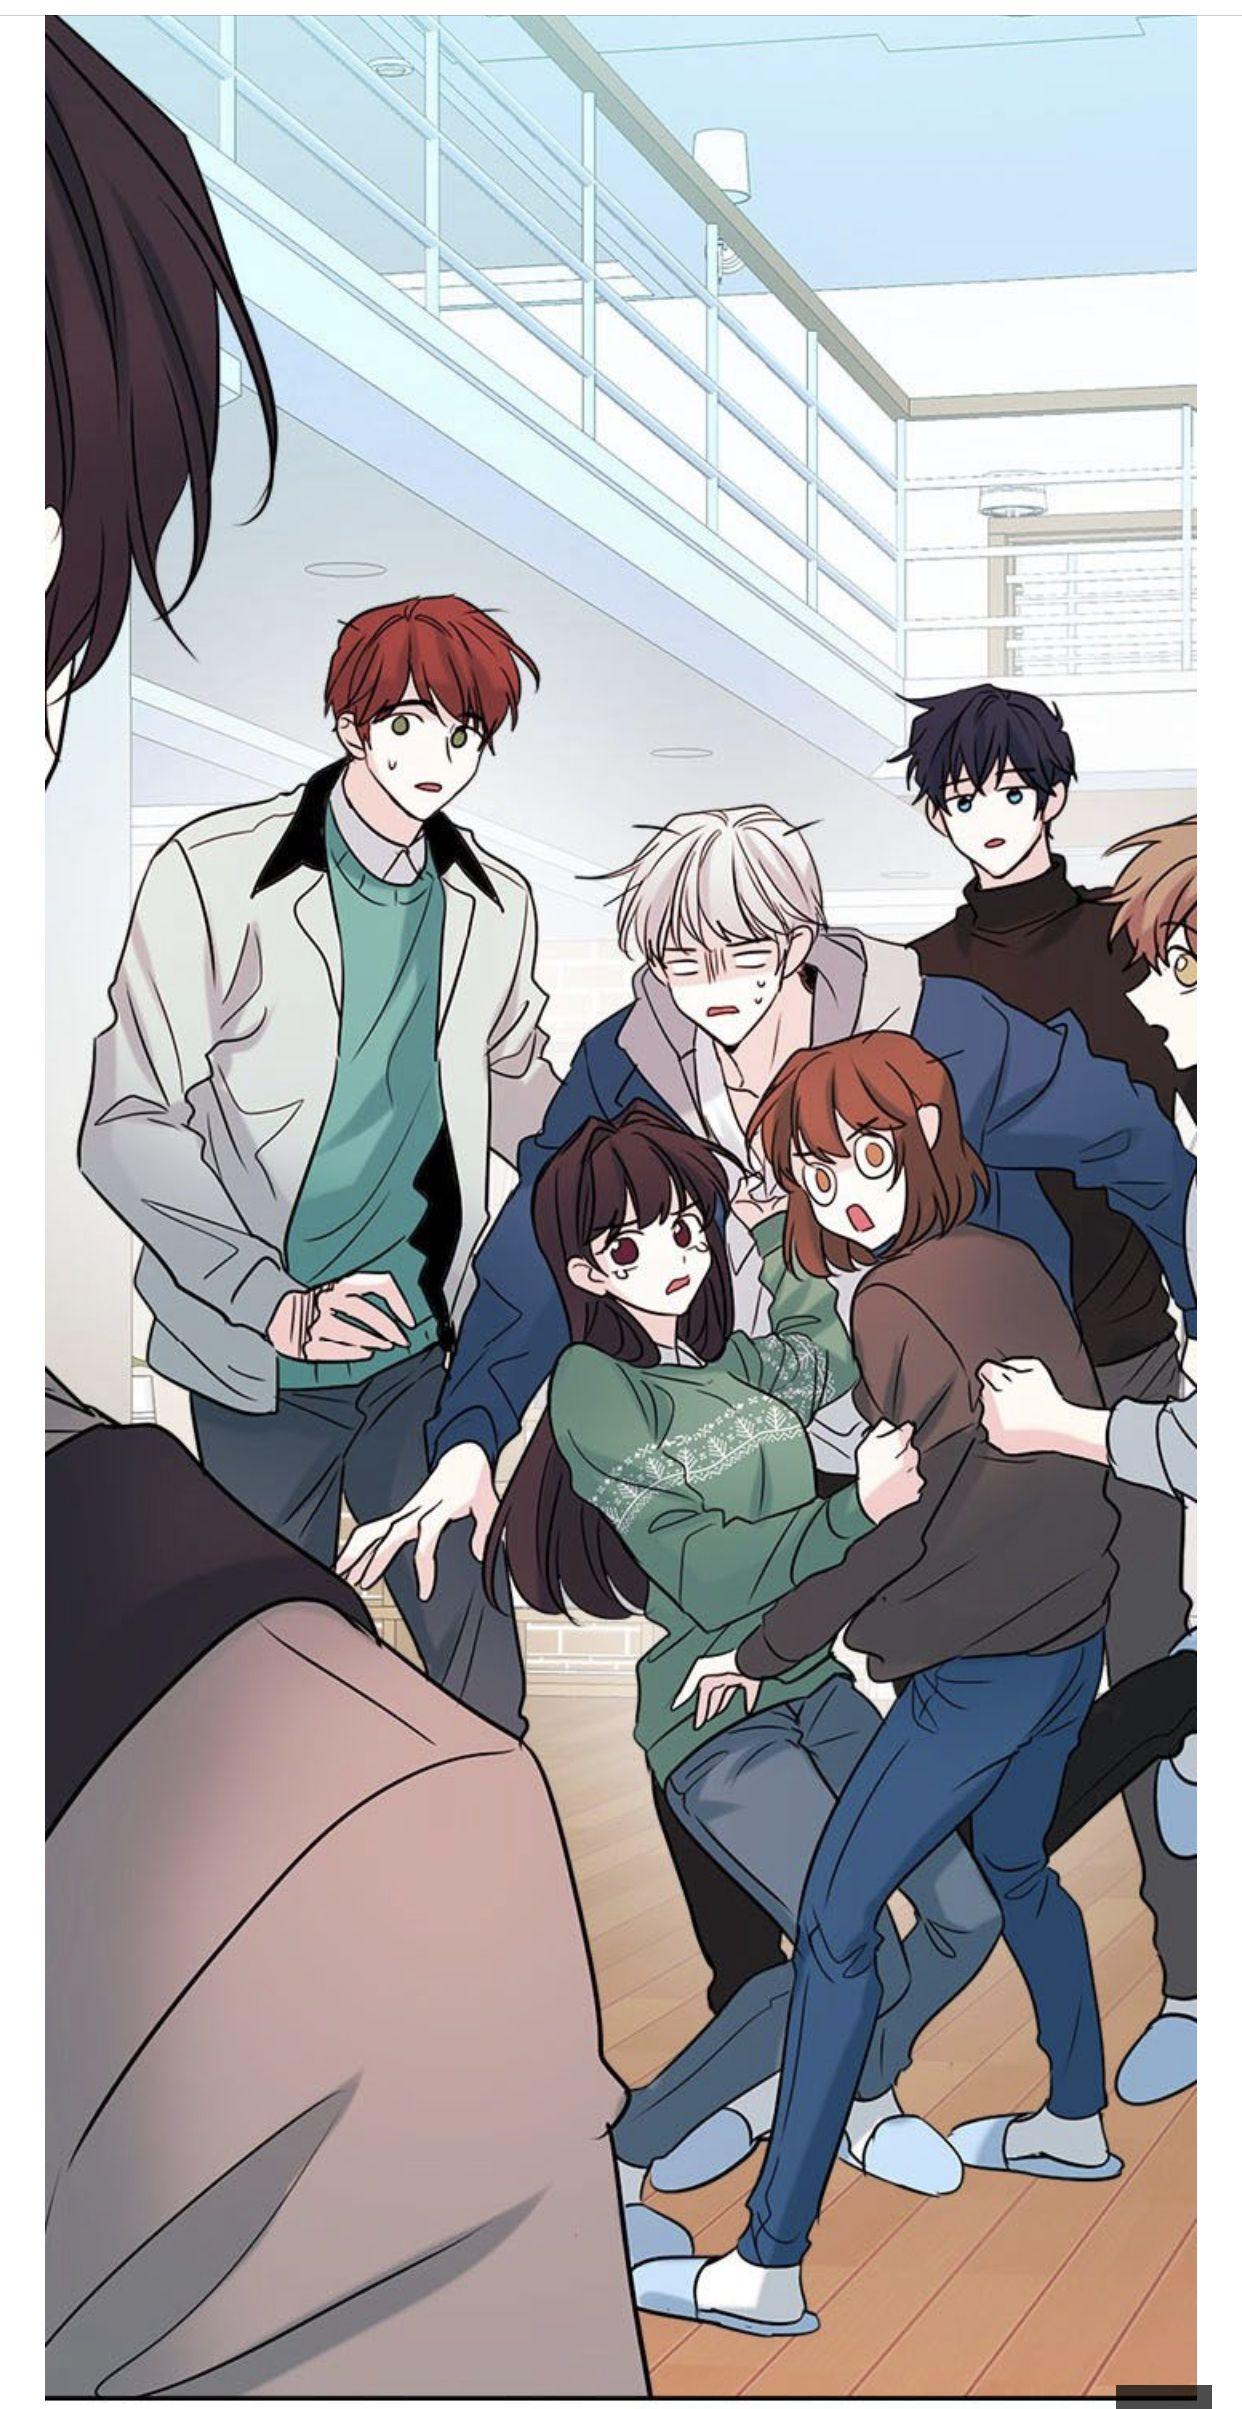 Inso S Law Friend Anime Manga Love Anime Friendship